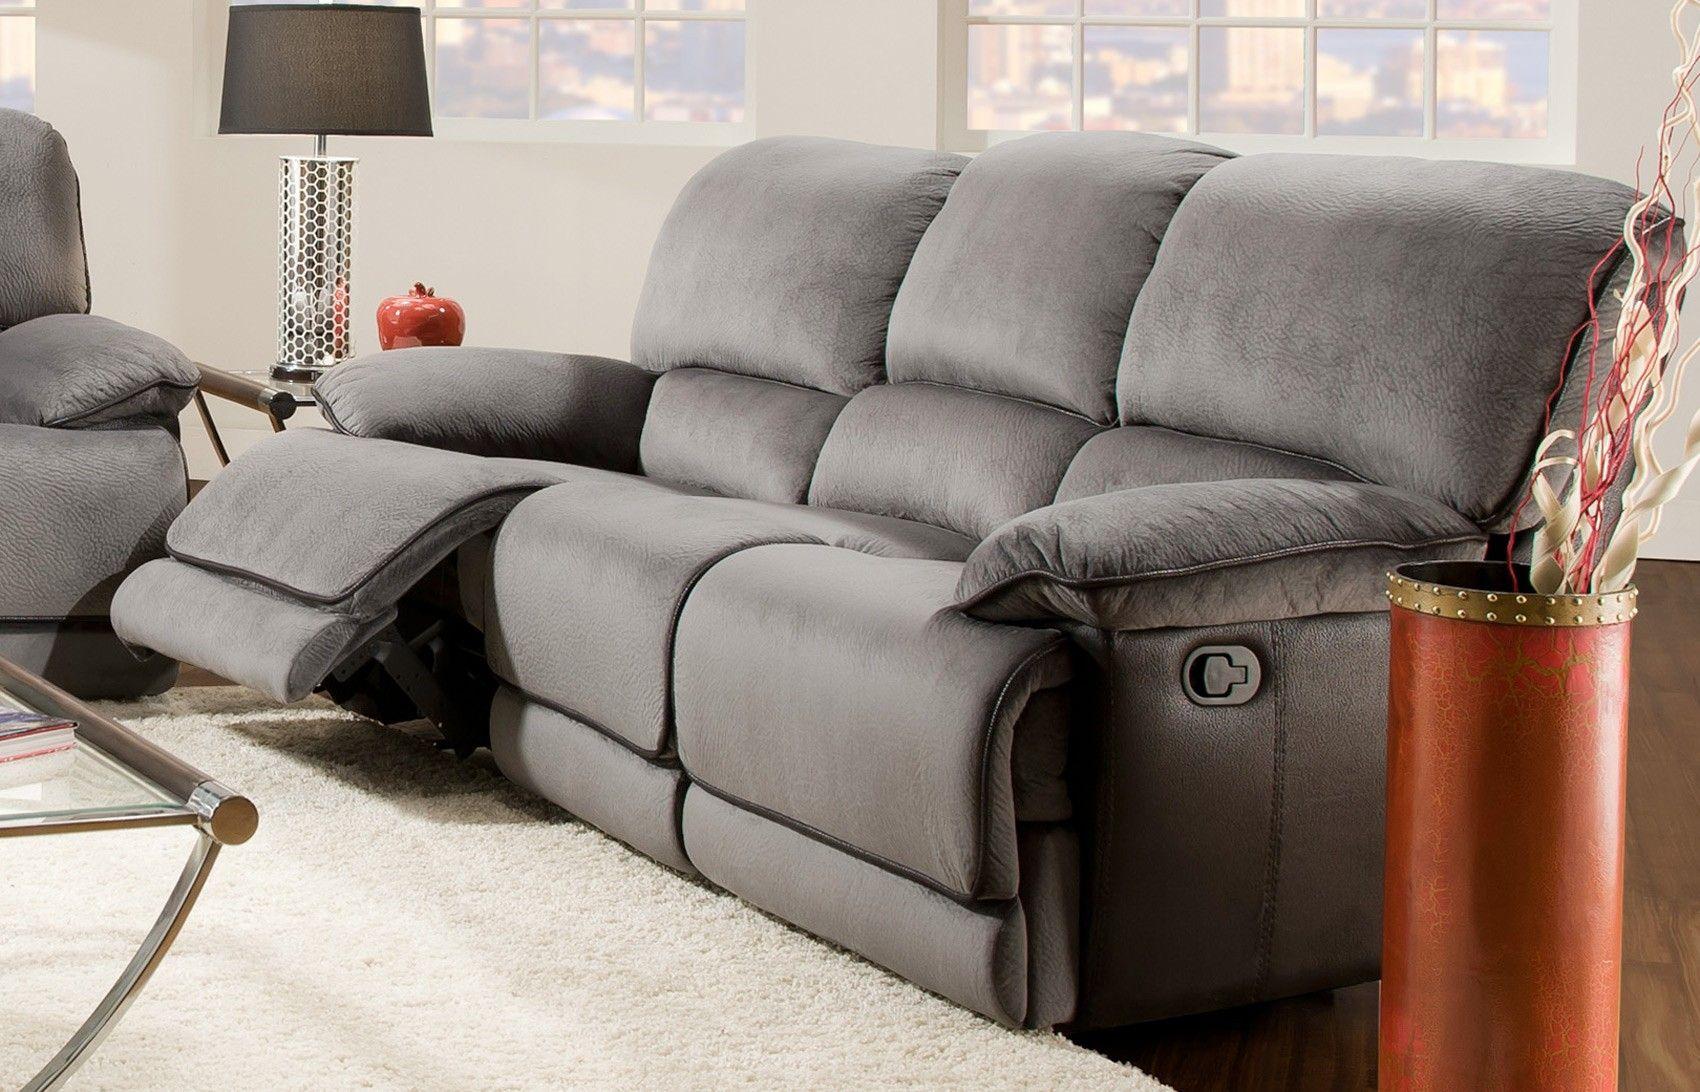 Rhino Reclining Sofa Grey 77930 Corinthian